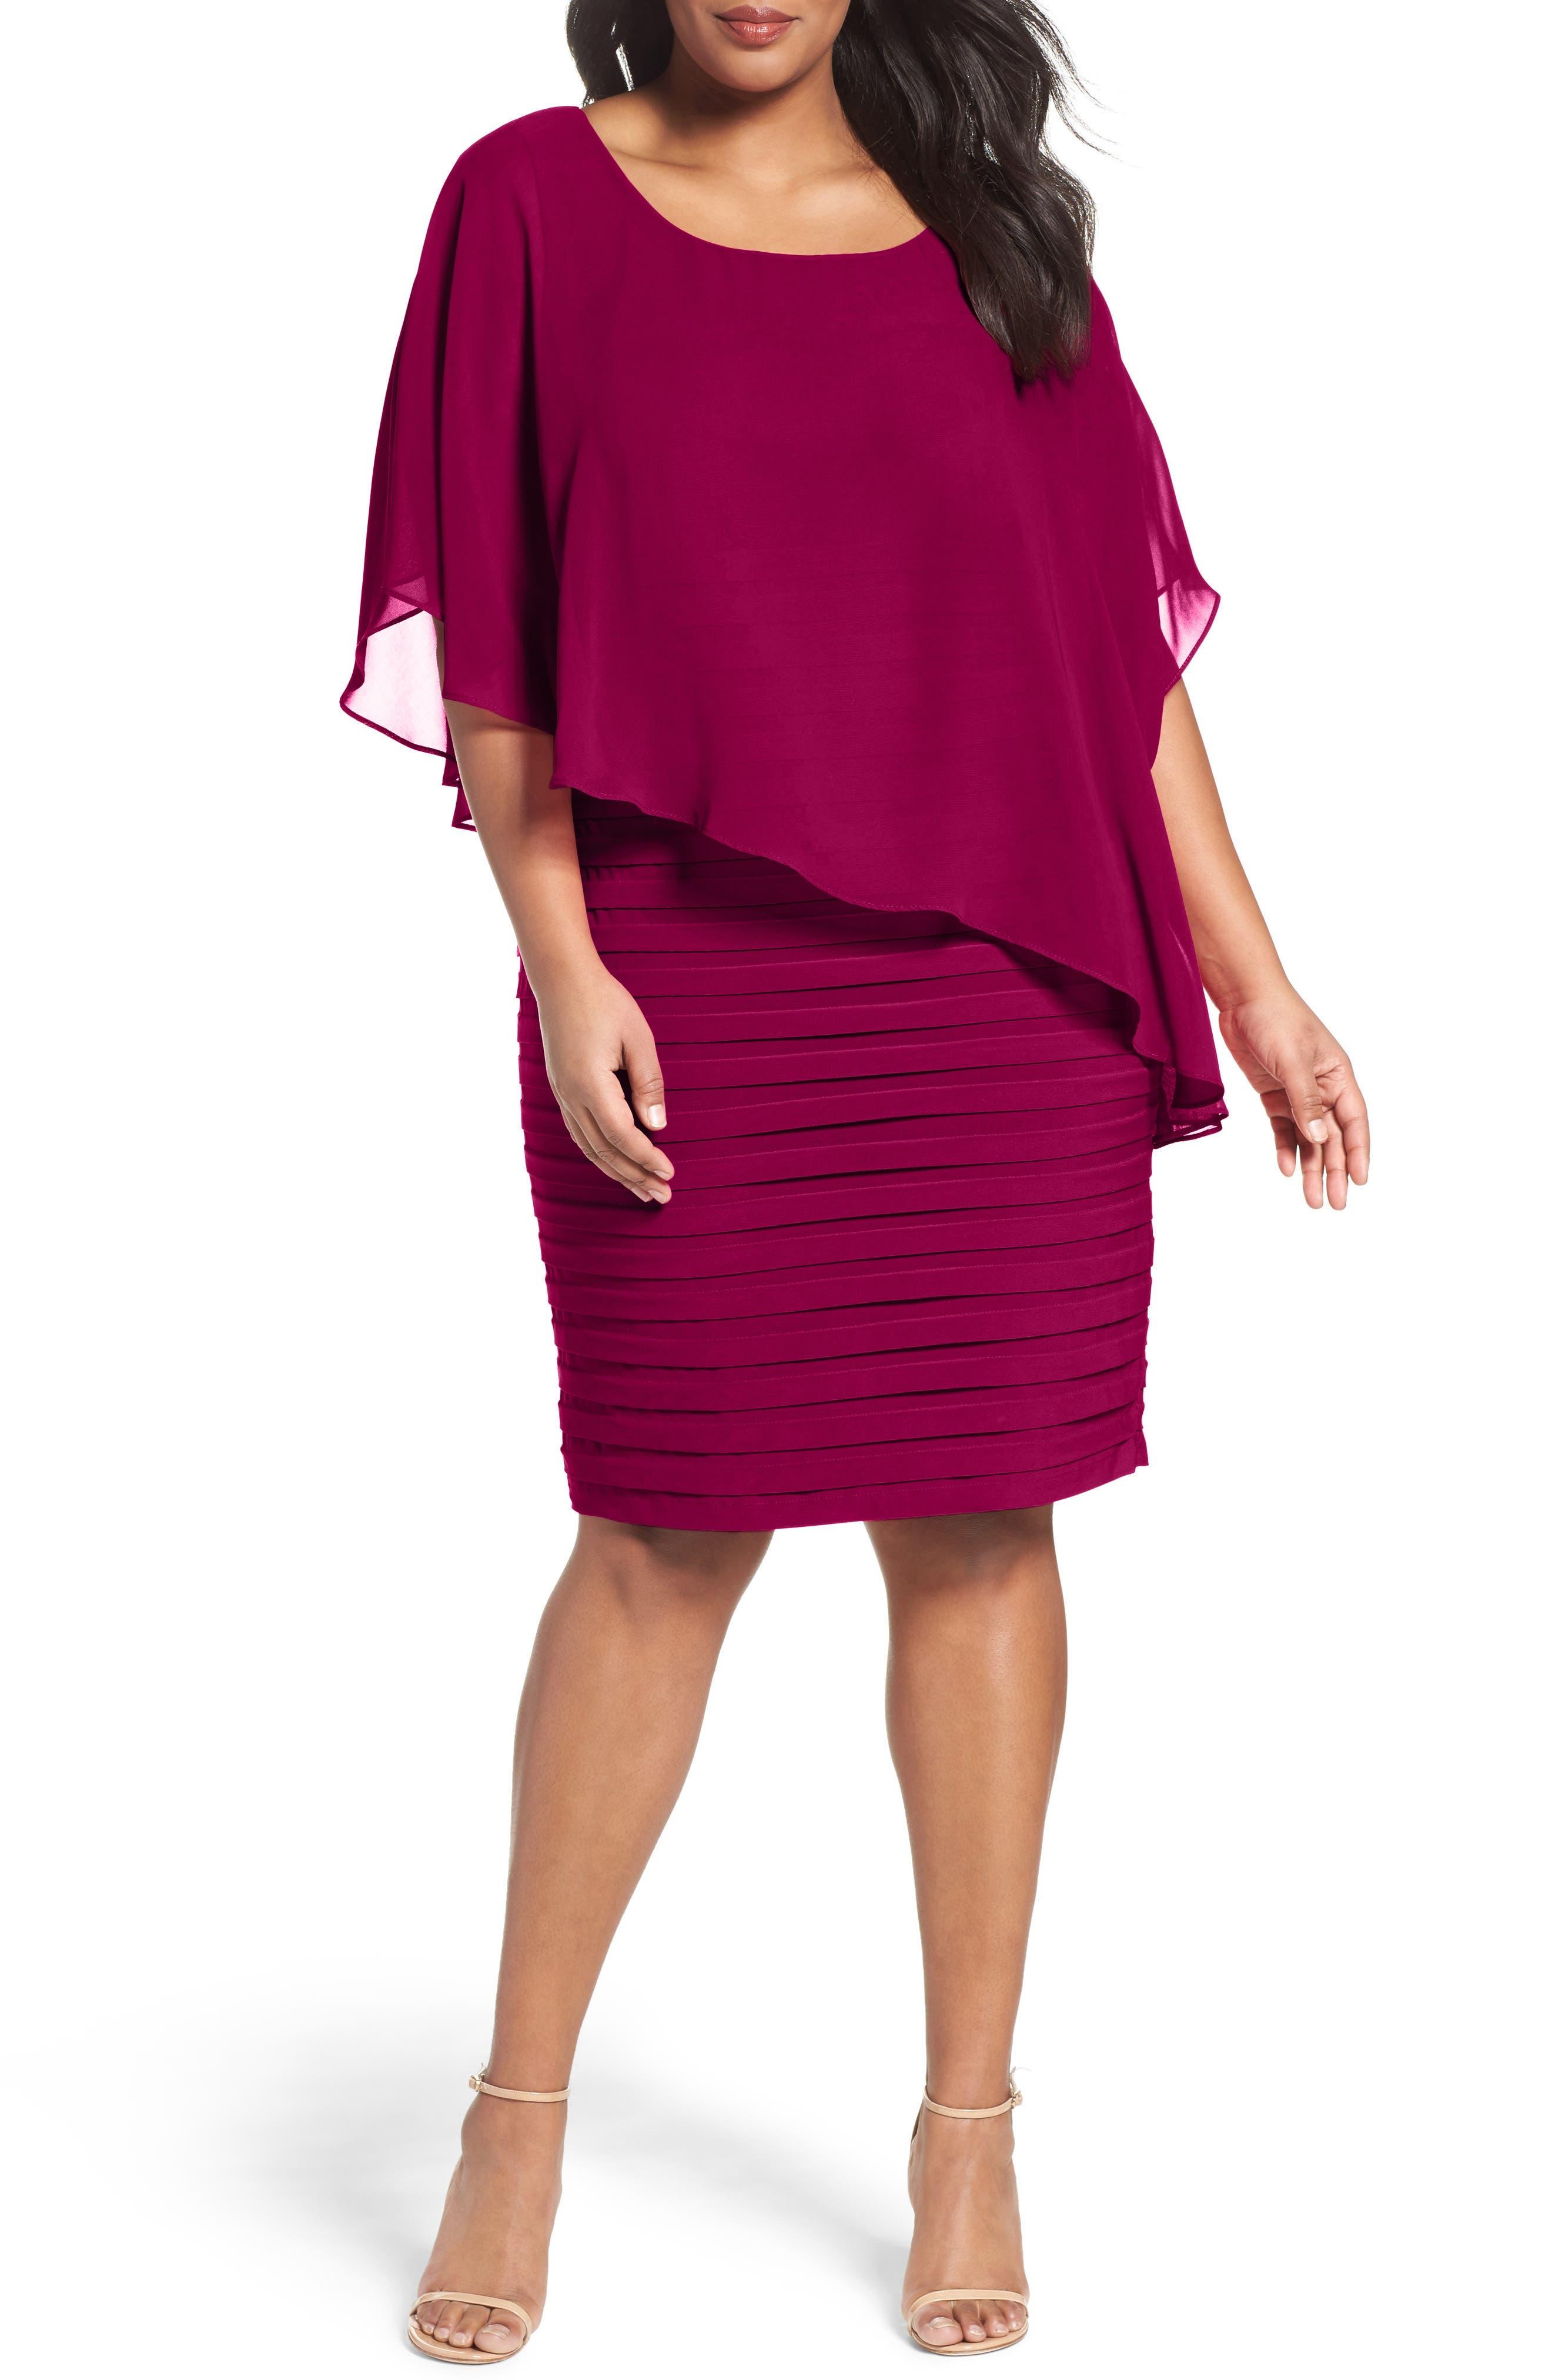 Image of Adrianna Papell Chiffon Overlay Shutter Pleat Sheath Dress